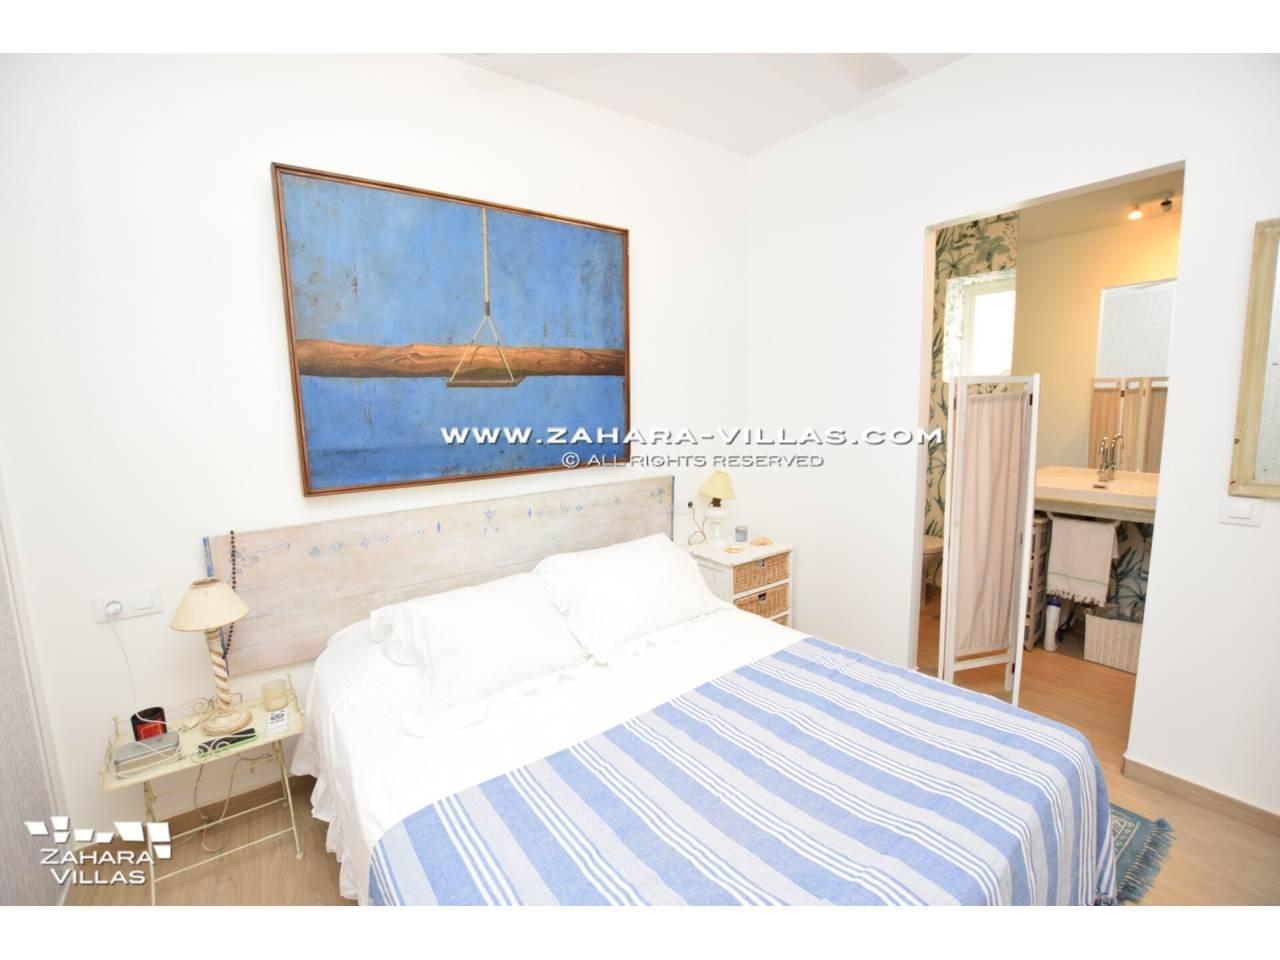 Imagen 20 de House for sale close to the beach, with sea views in Zahara de los Atunes